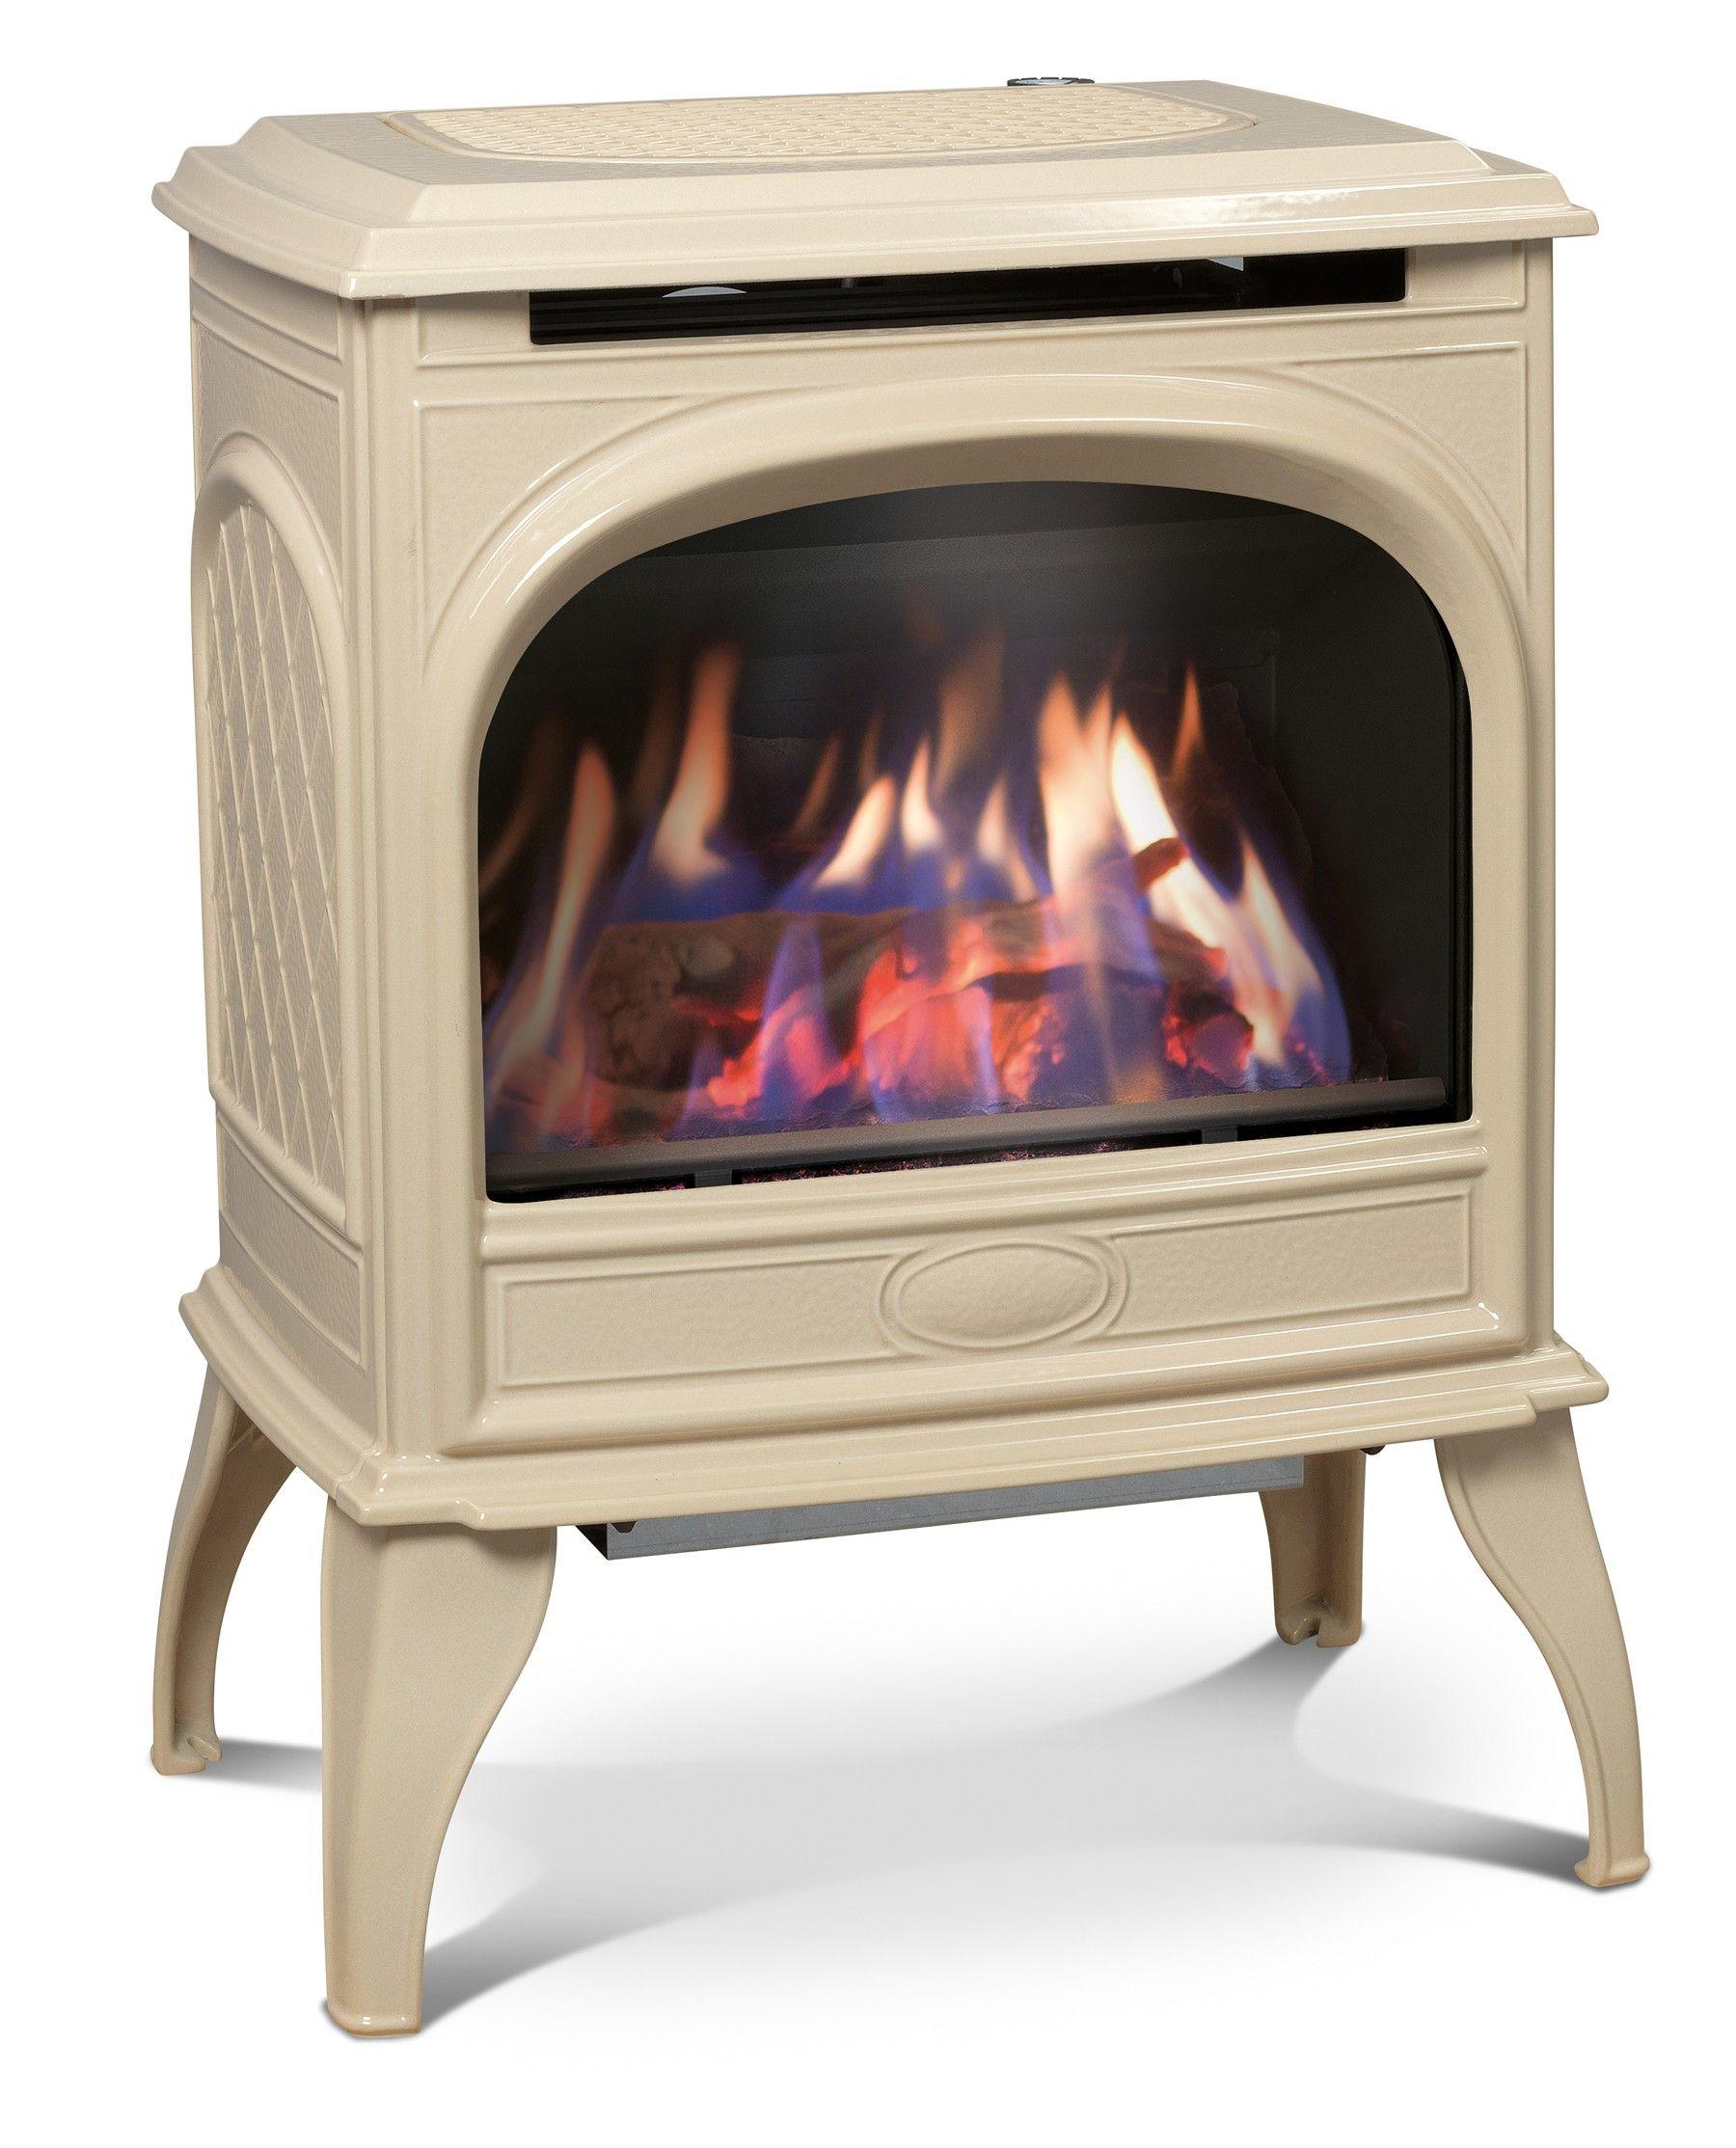 dovre gasofen 425ga gas kaminofen pinterest kaminofen. Black Bedroom Furniture Sets. Home Design Ideas